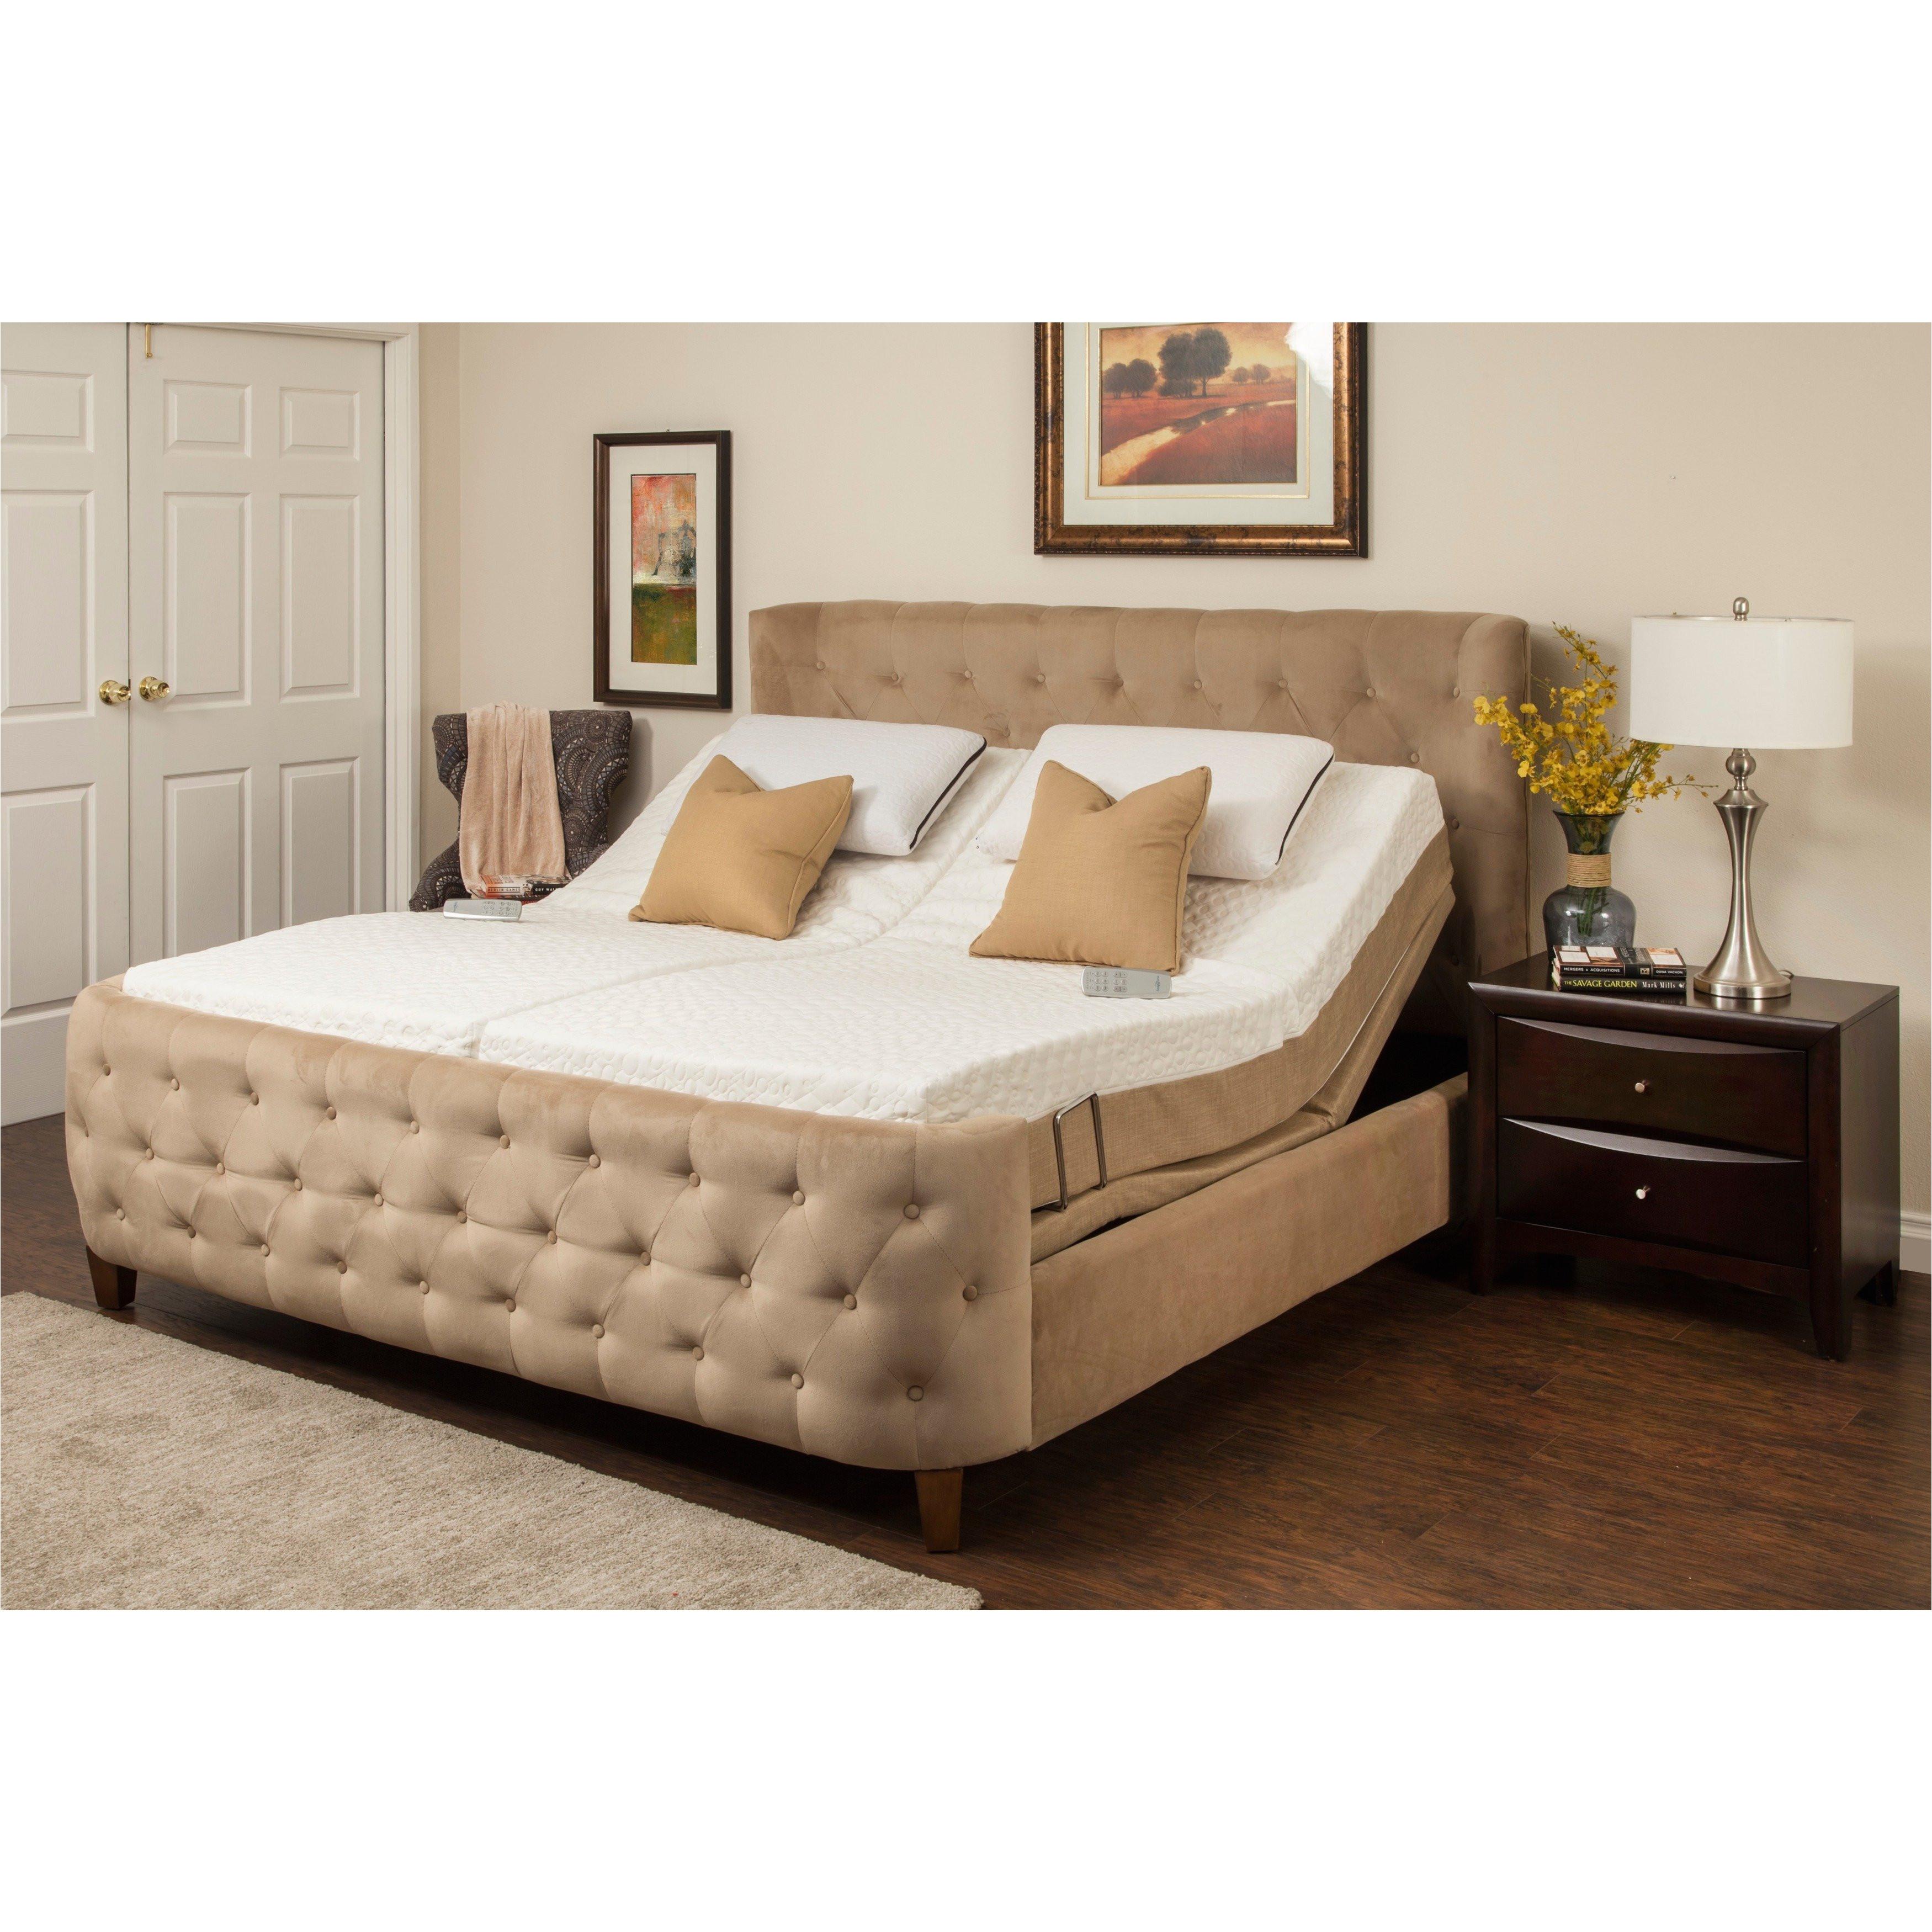 shop sleep zone malibu 12 inch split california king size memory foam and latex adjustable mattress set on sale free shipping today overstock com